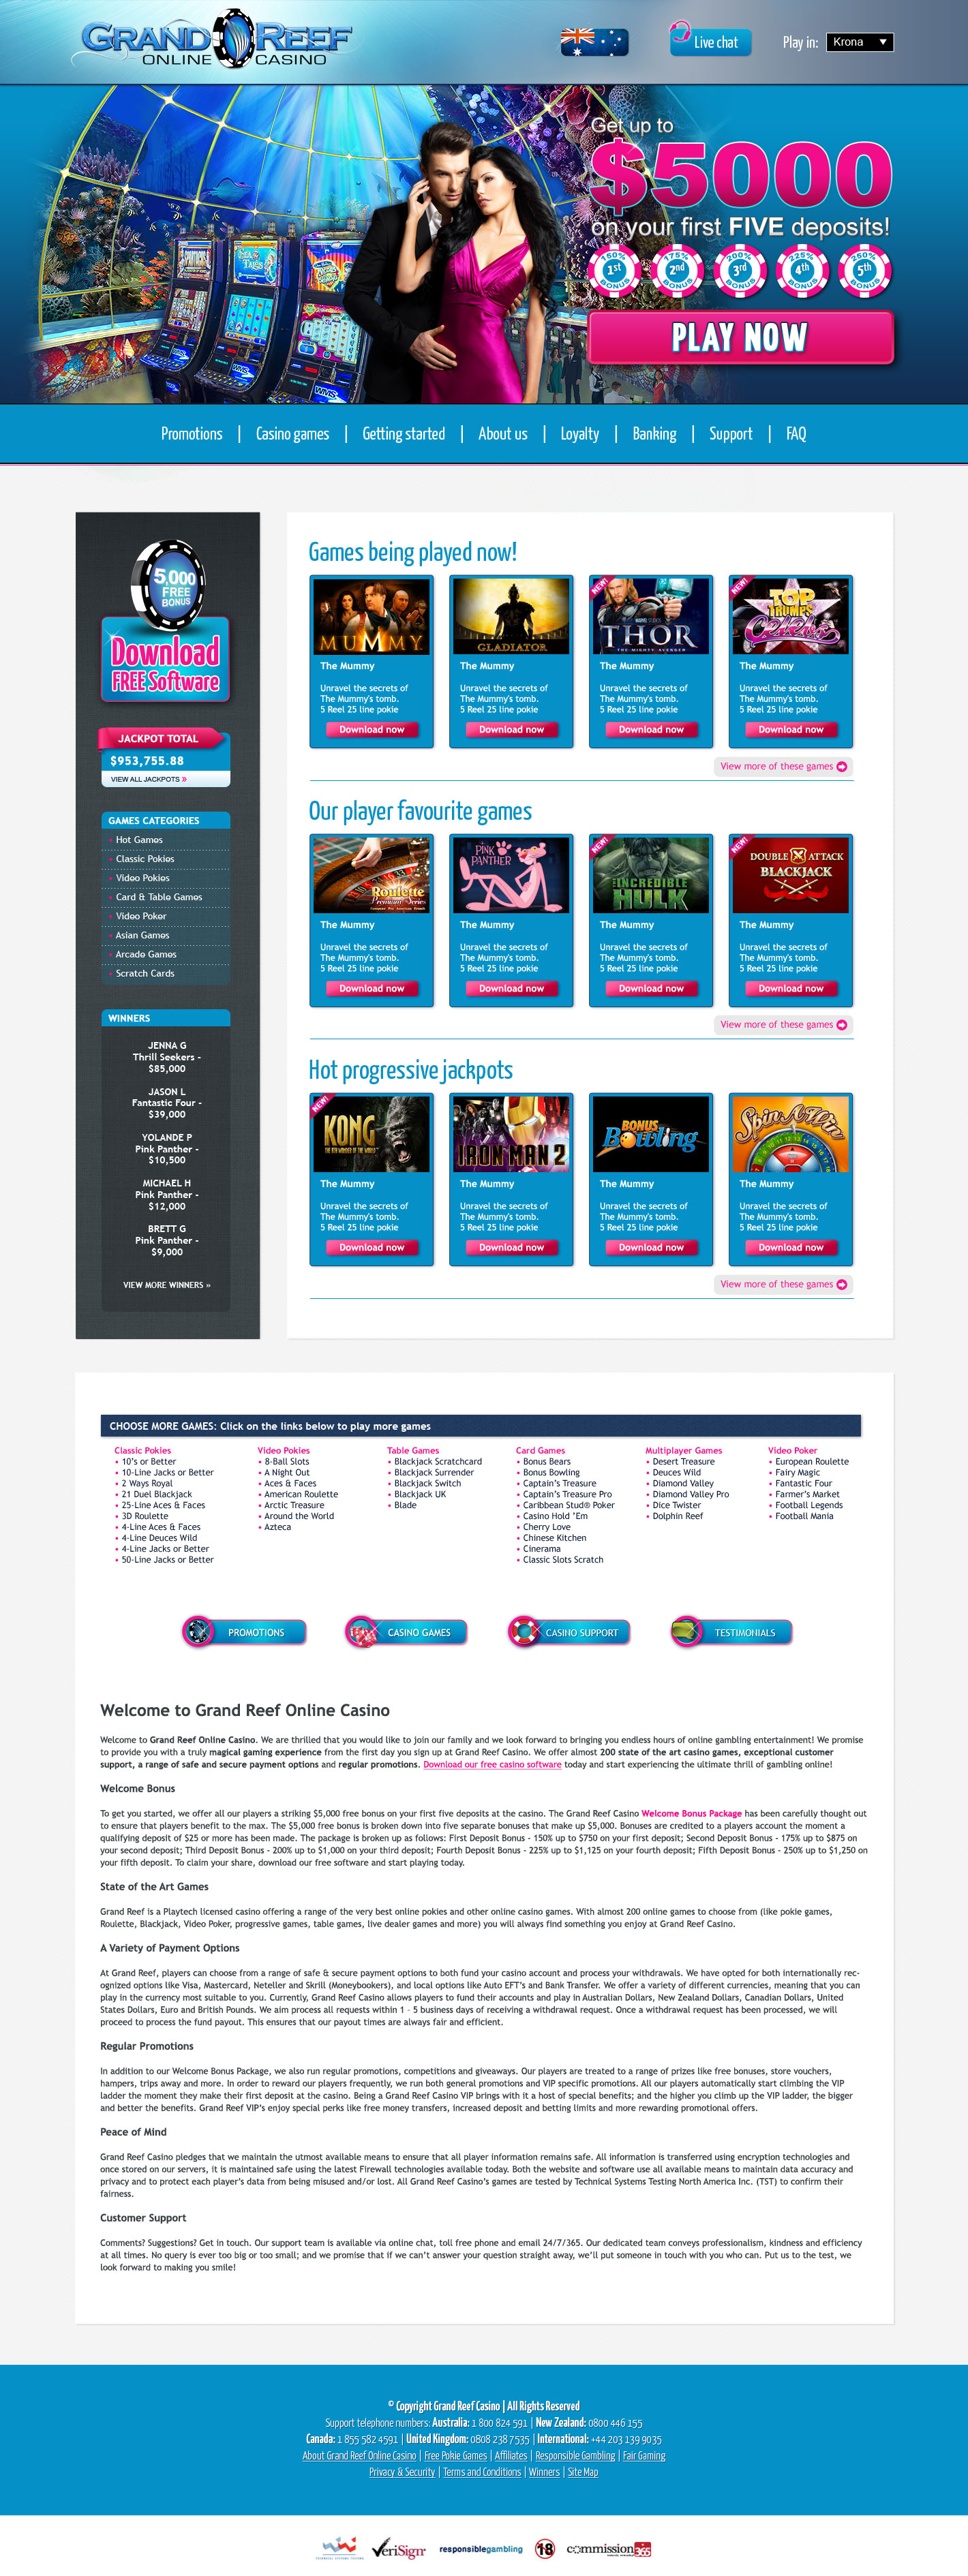 Design for Grand Reef Casino